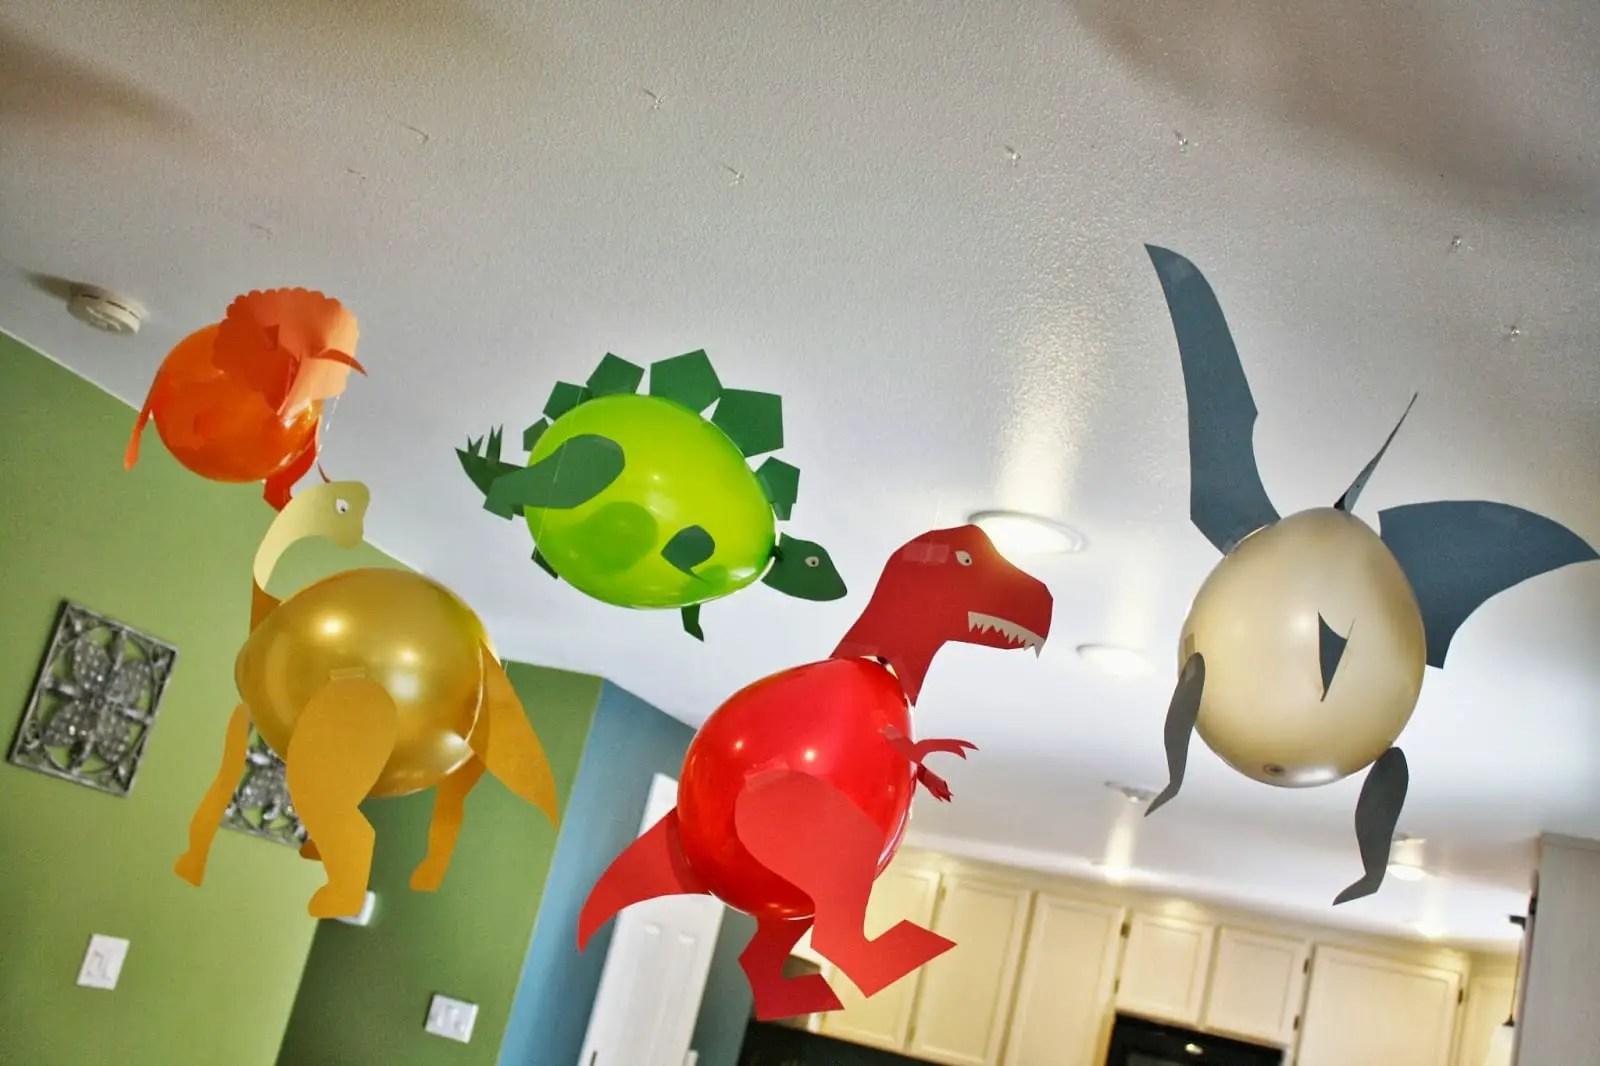 Nuevo libro para colorear con dibujos de unicornios. Globos con figuras para fiesta infantiles - Dale Detalles